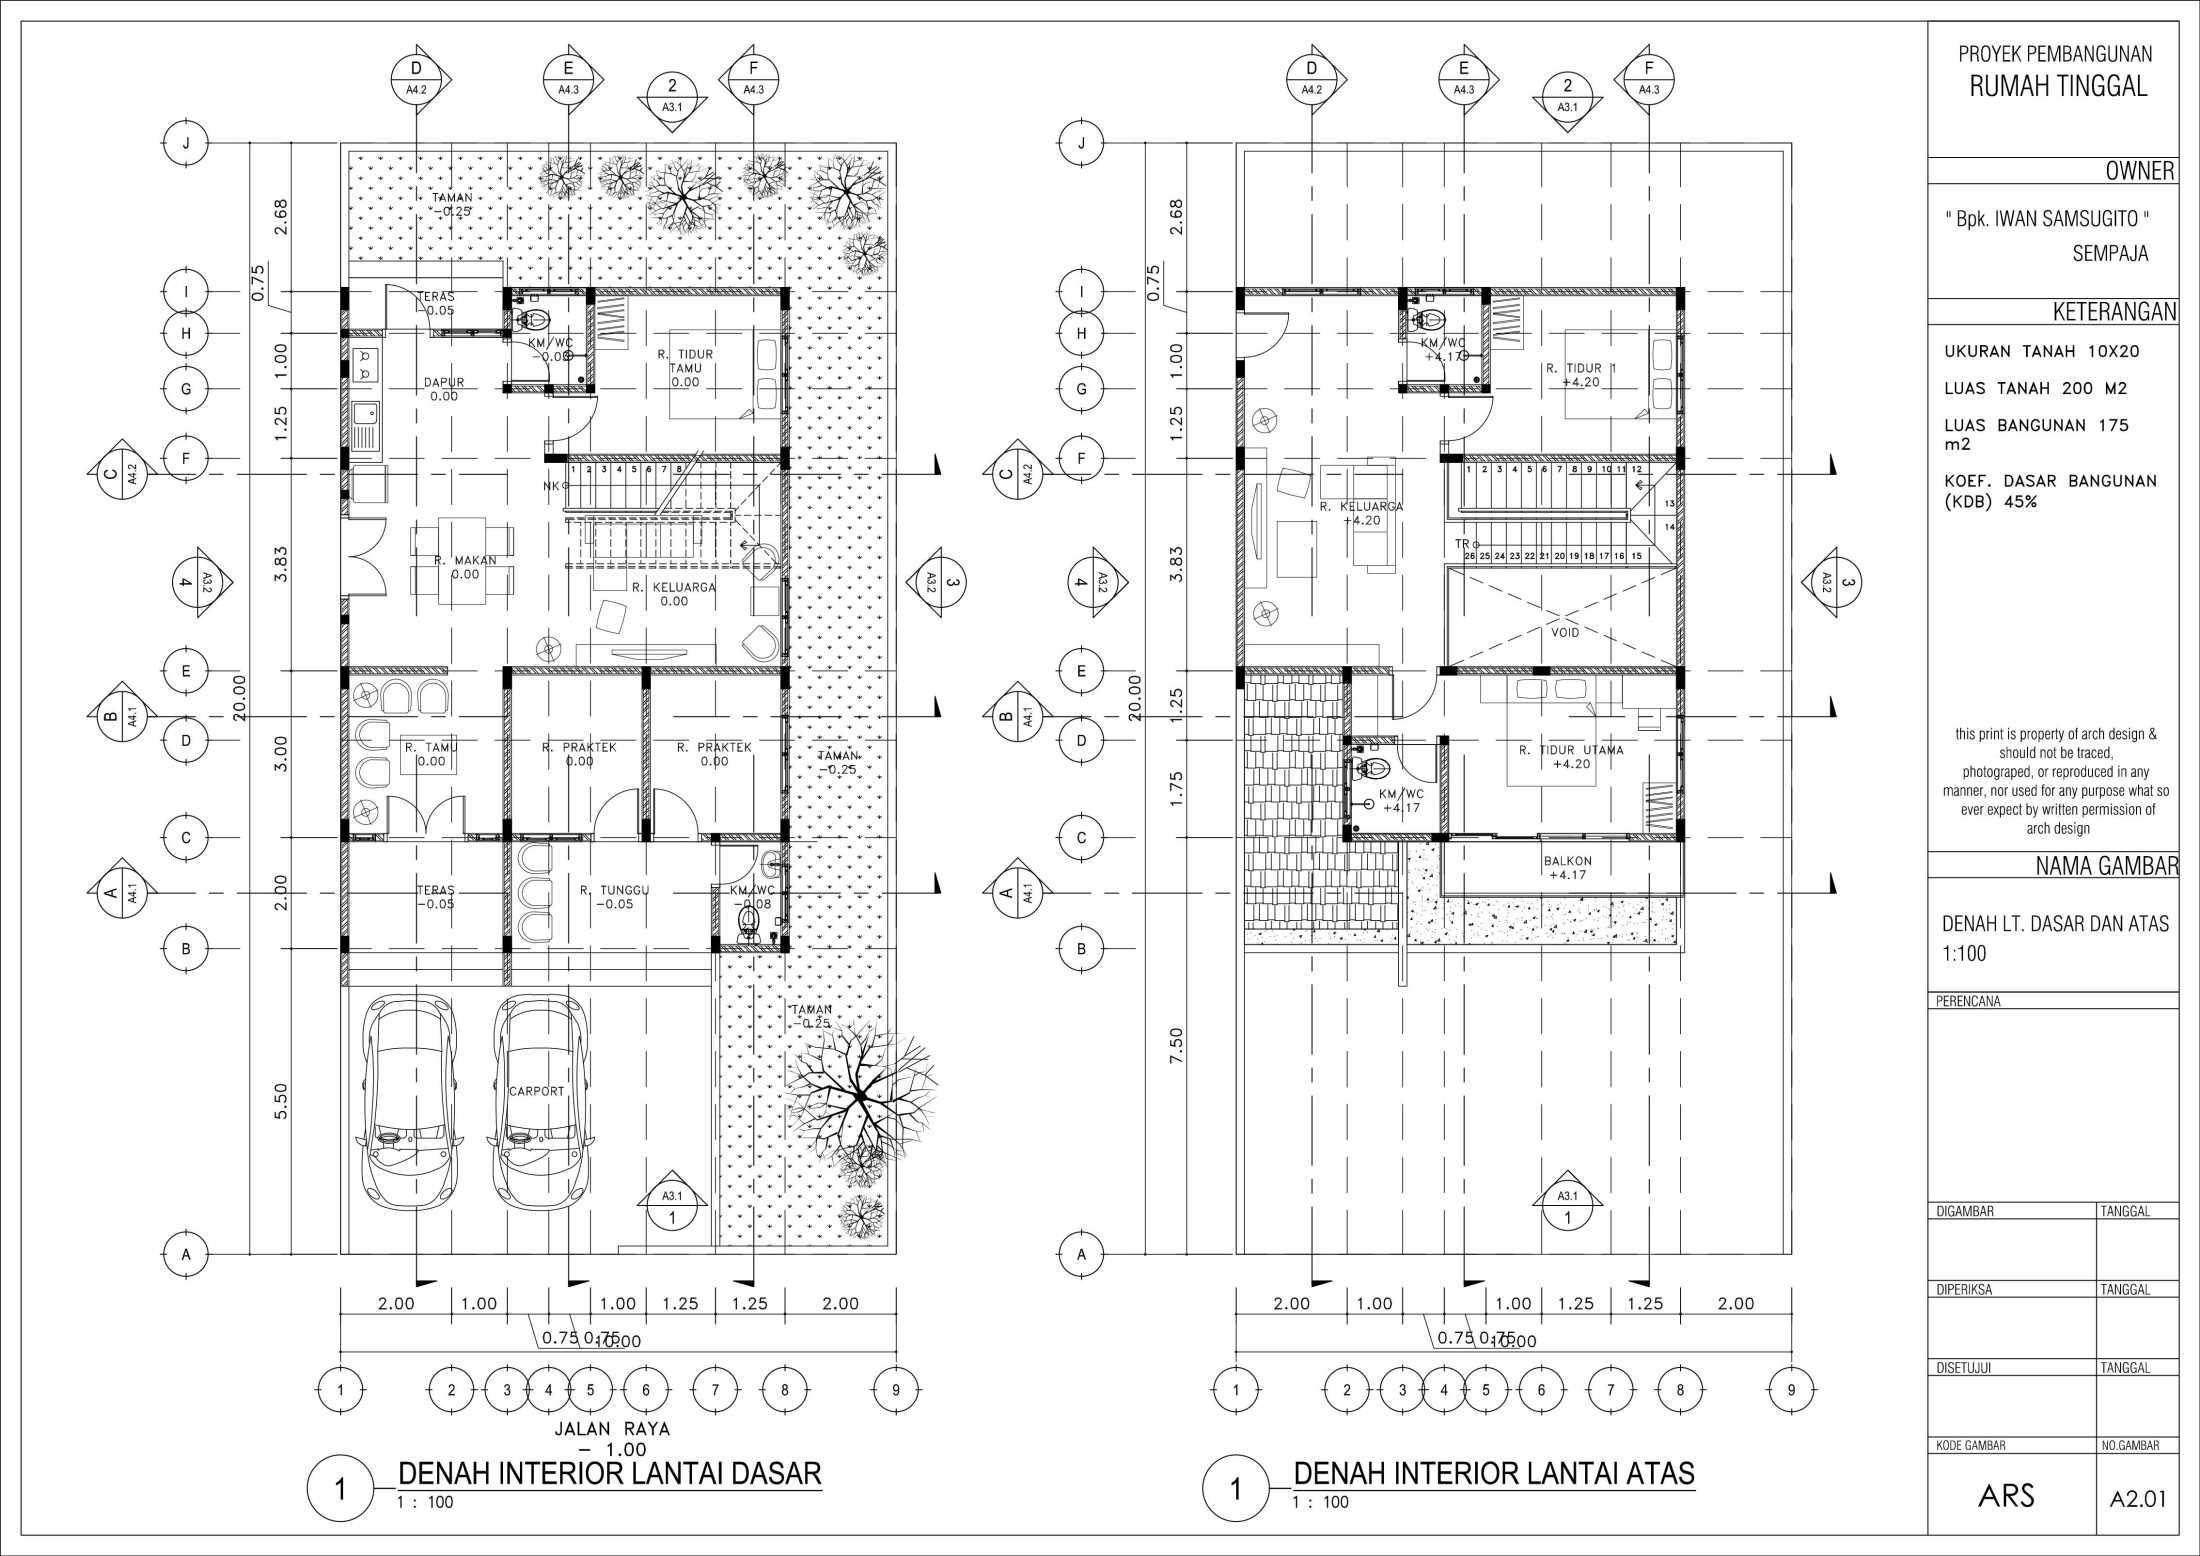 Artisia Studio House Of Mr Iwan (Samarinda) Kota Samarinda, Kalimantan Timur, Indonesia Kota Samarinda, Kalimantan Timur, Indonesia Artisia-Studio-House-Of-Mr-Iwan-Samarinda  80250